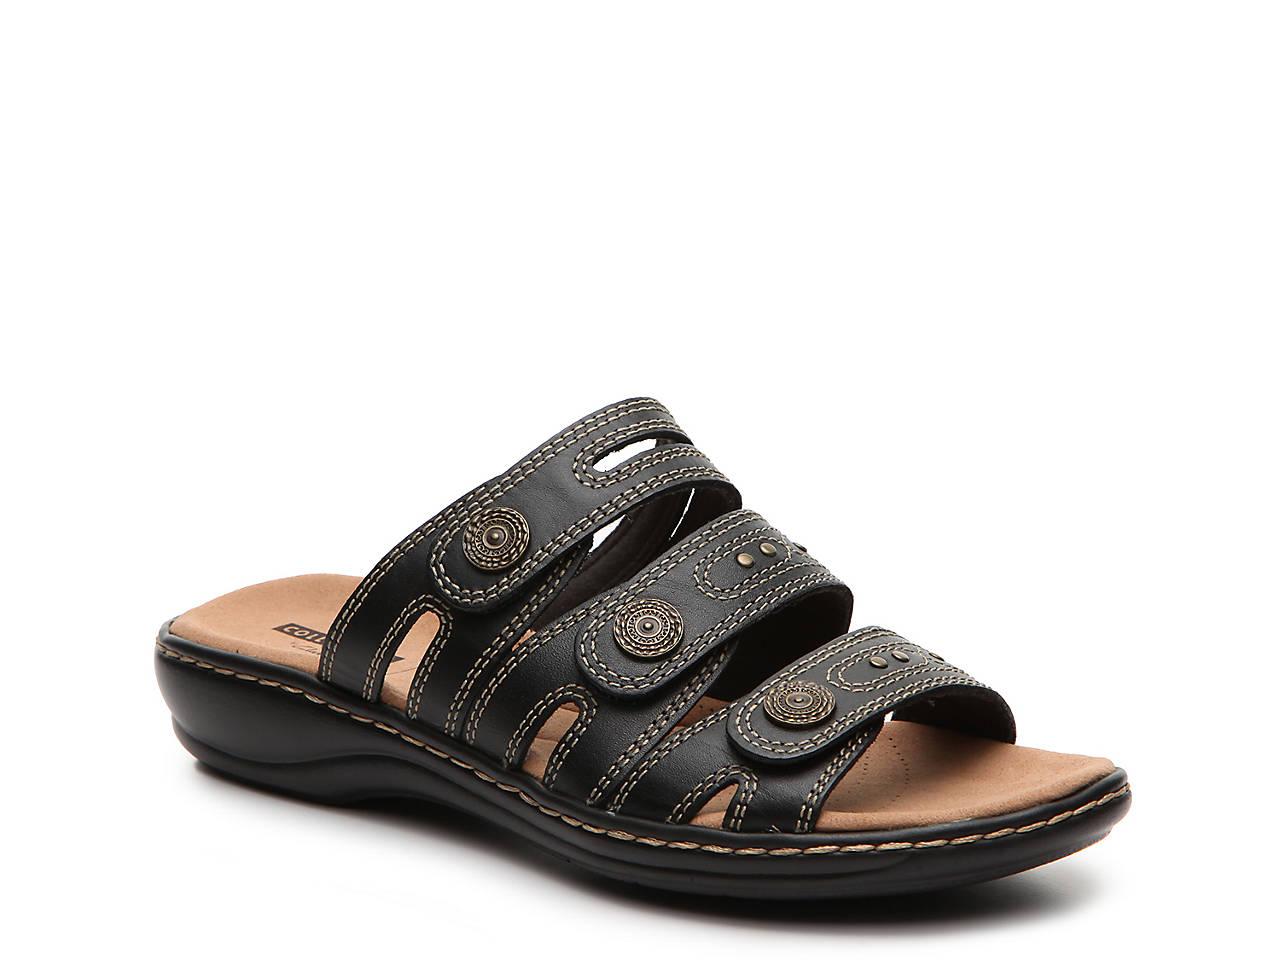 dd80bcae2e4 Clarks Leisa Lakia Sandal Women s Shoes